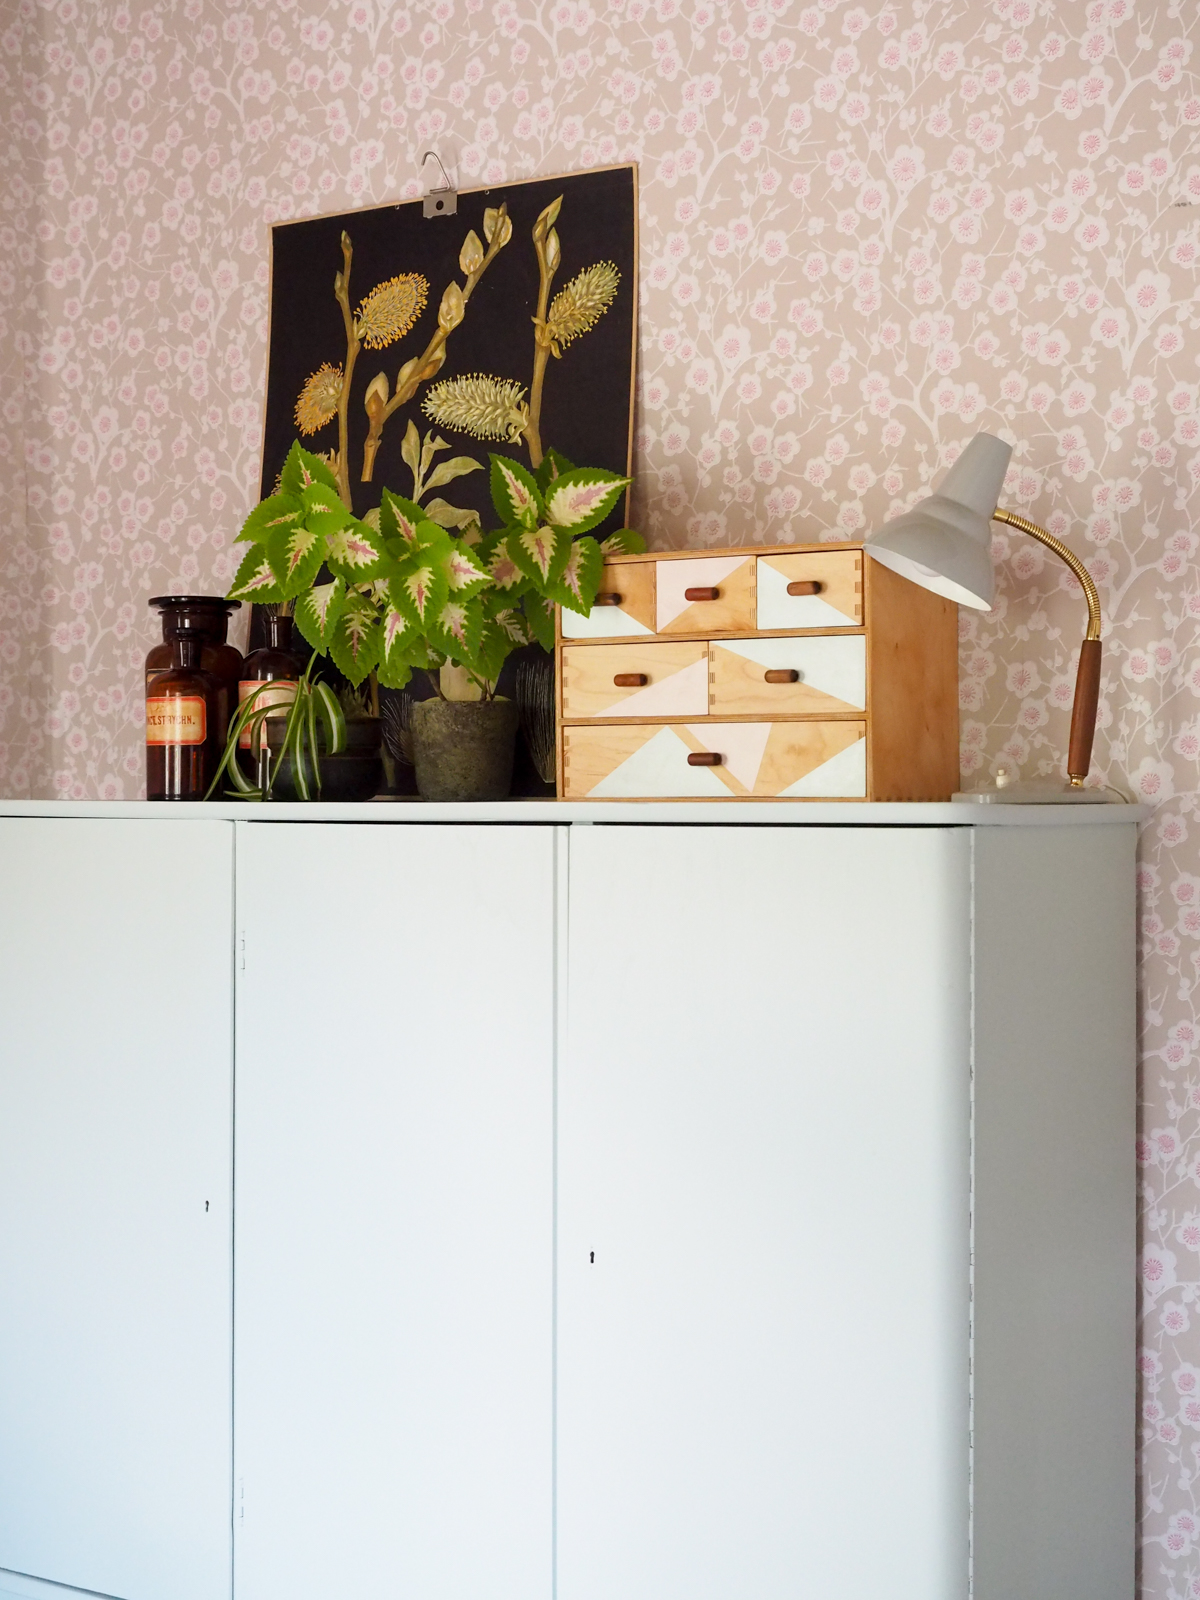 Ike Moppe-lokerikon tuunaus, Ikea hack